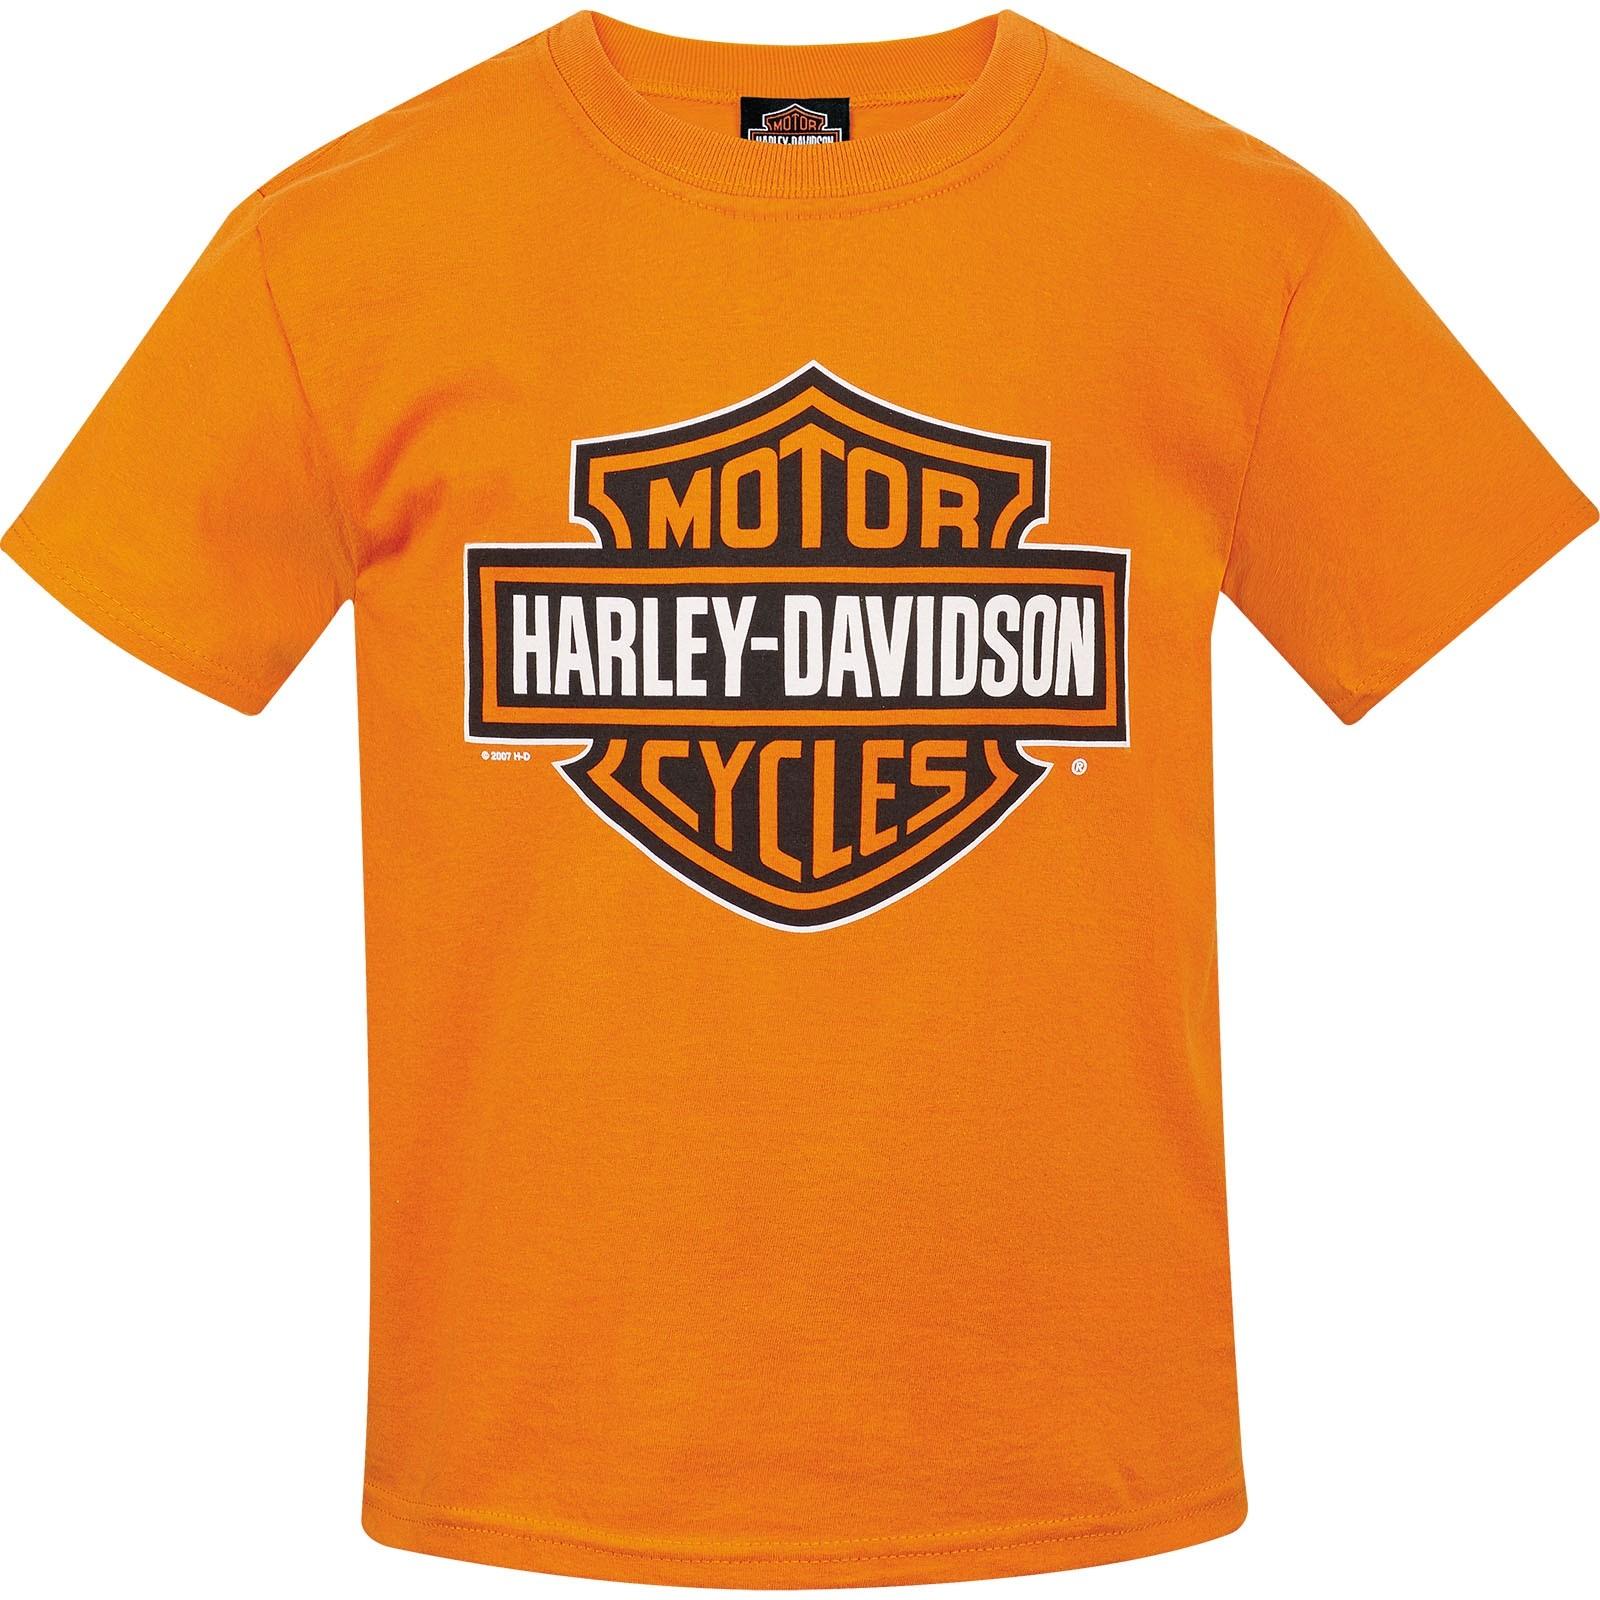 Kids Bar & Shield Graphic Orange T-shirt | Camp Humphreys